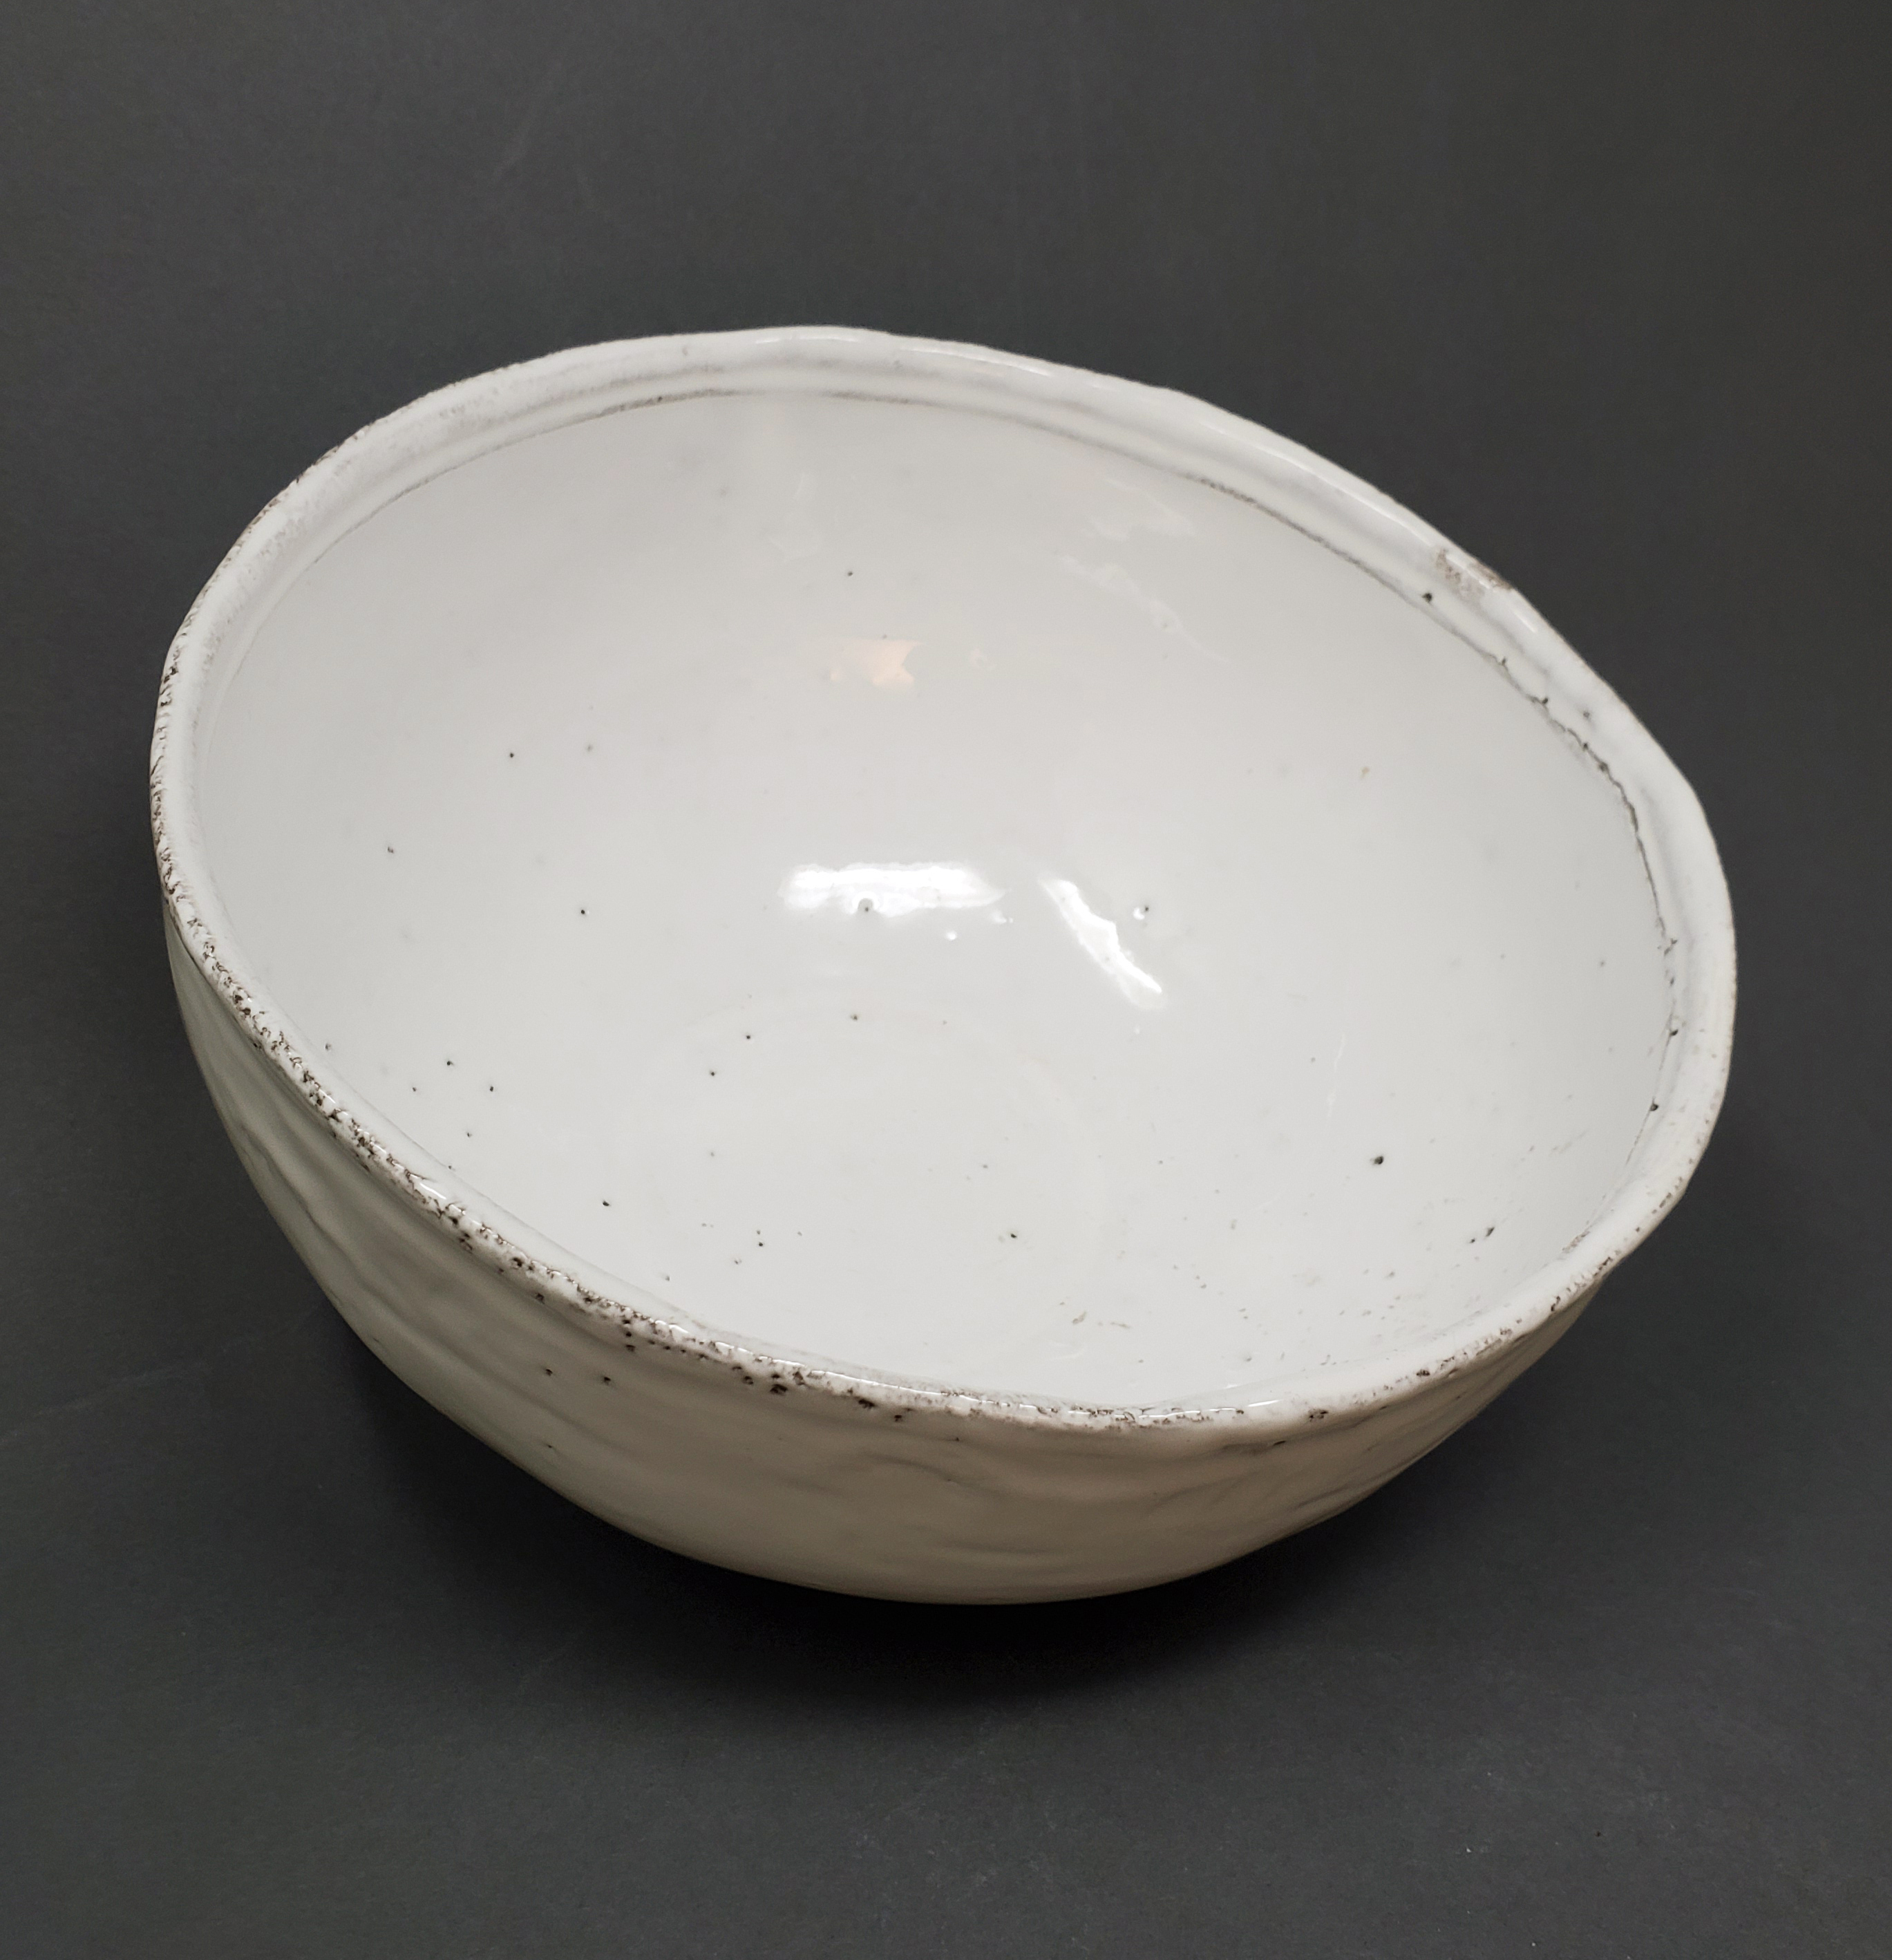 astier-de-villatte-bowl-large.jpg